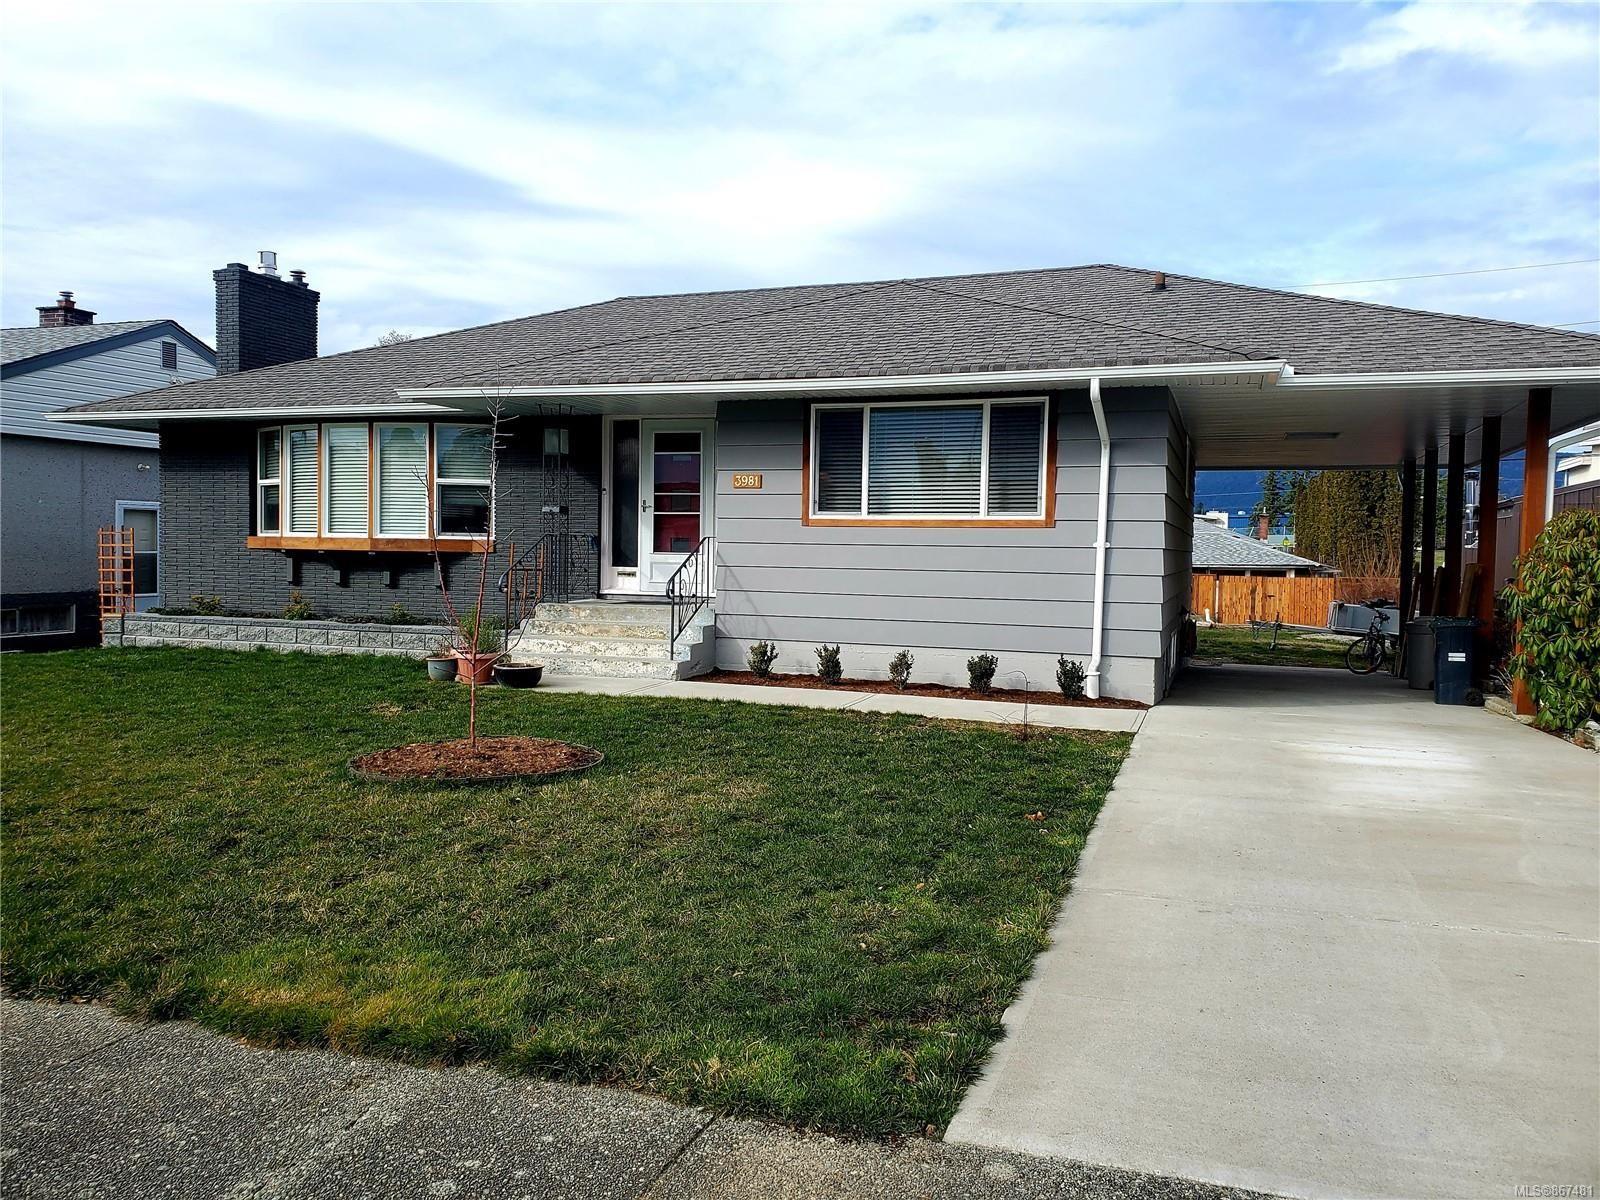 Main Photo: 3981 Exton St in : PA Port Alberni House for sale (Port Alberni)  : MLS®# 867481